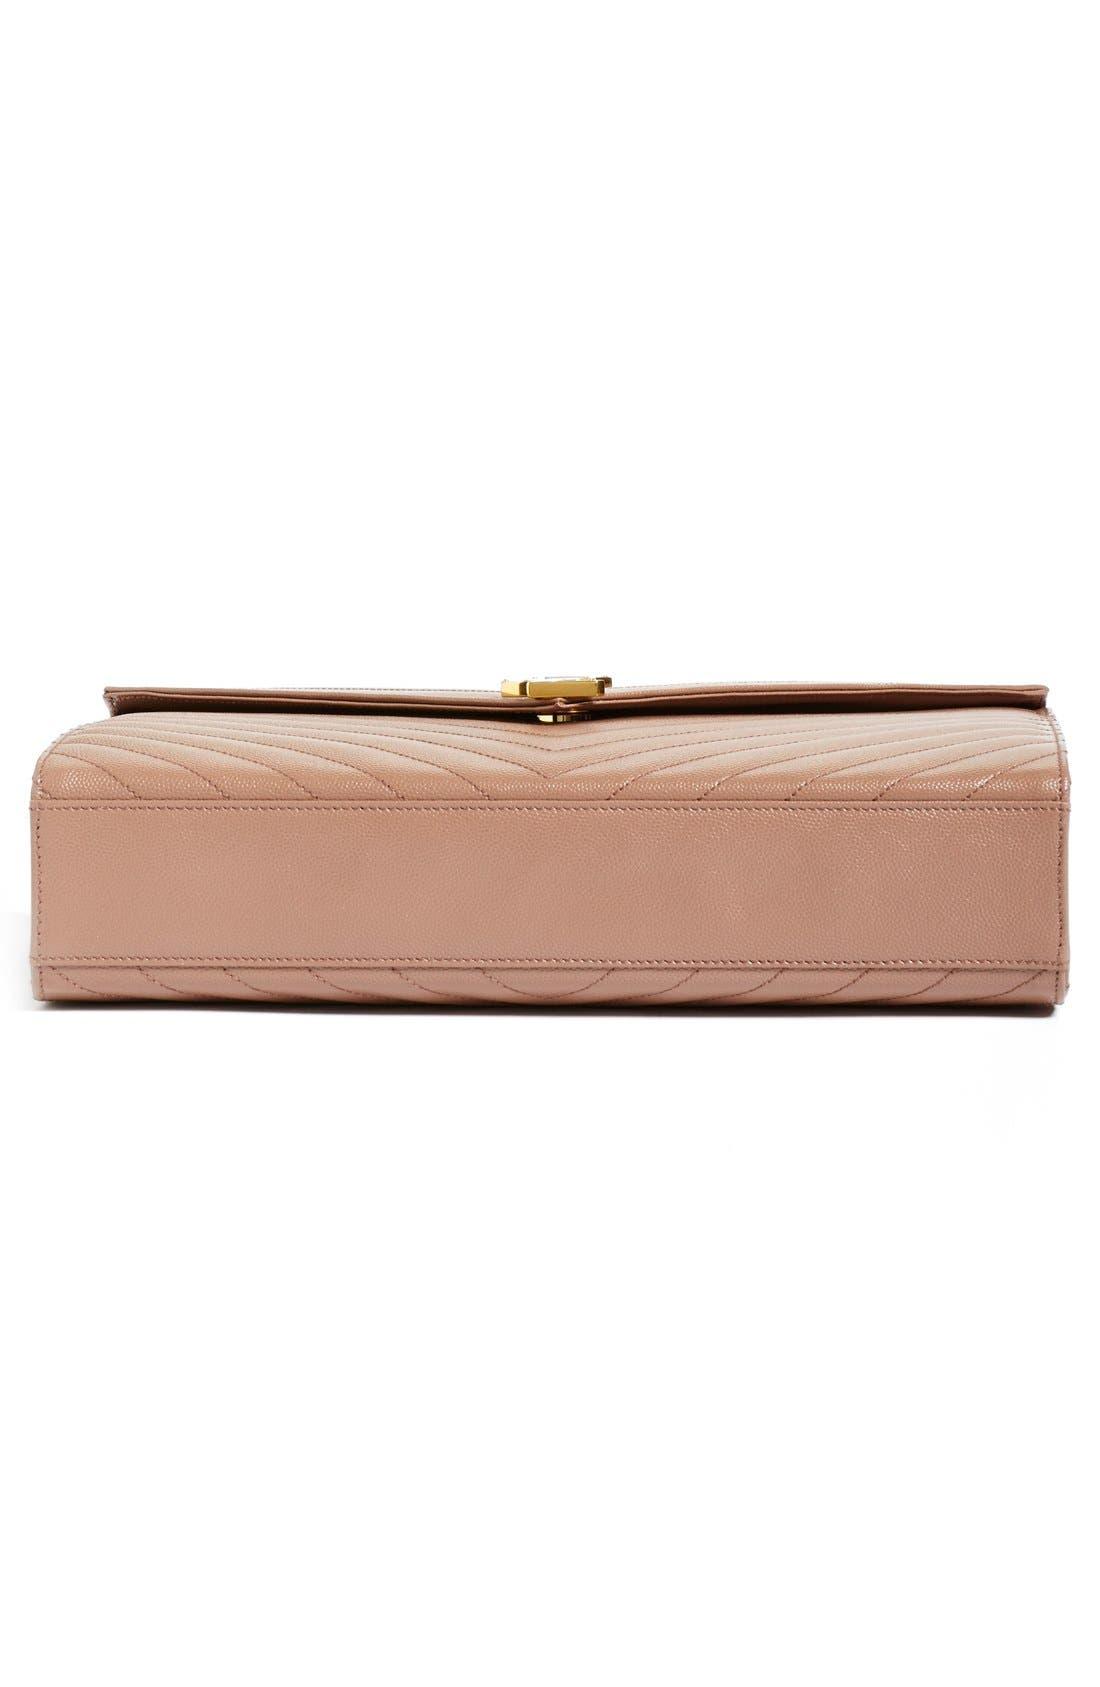 ,                             'Large Monogram' Grained Leather Shoulder Bag,                             Alternate thumbnail 40, color,                             650